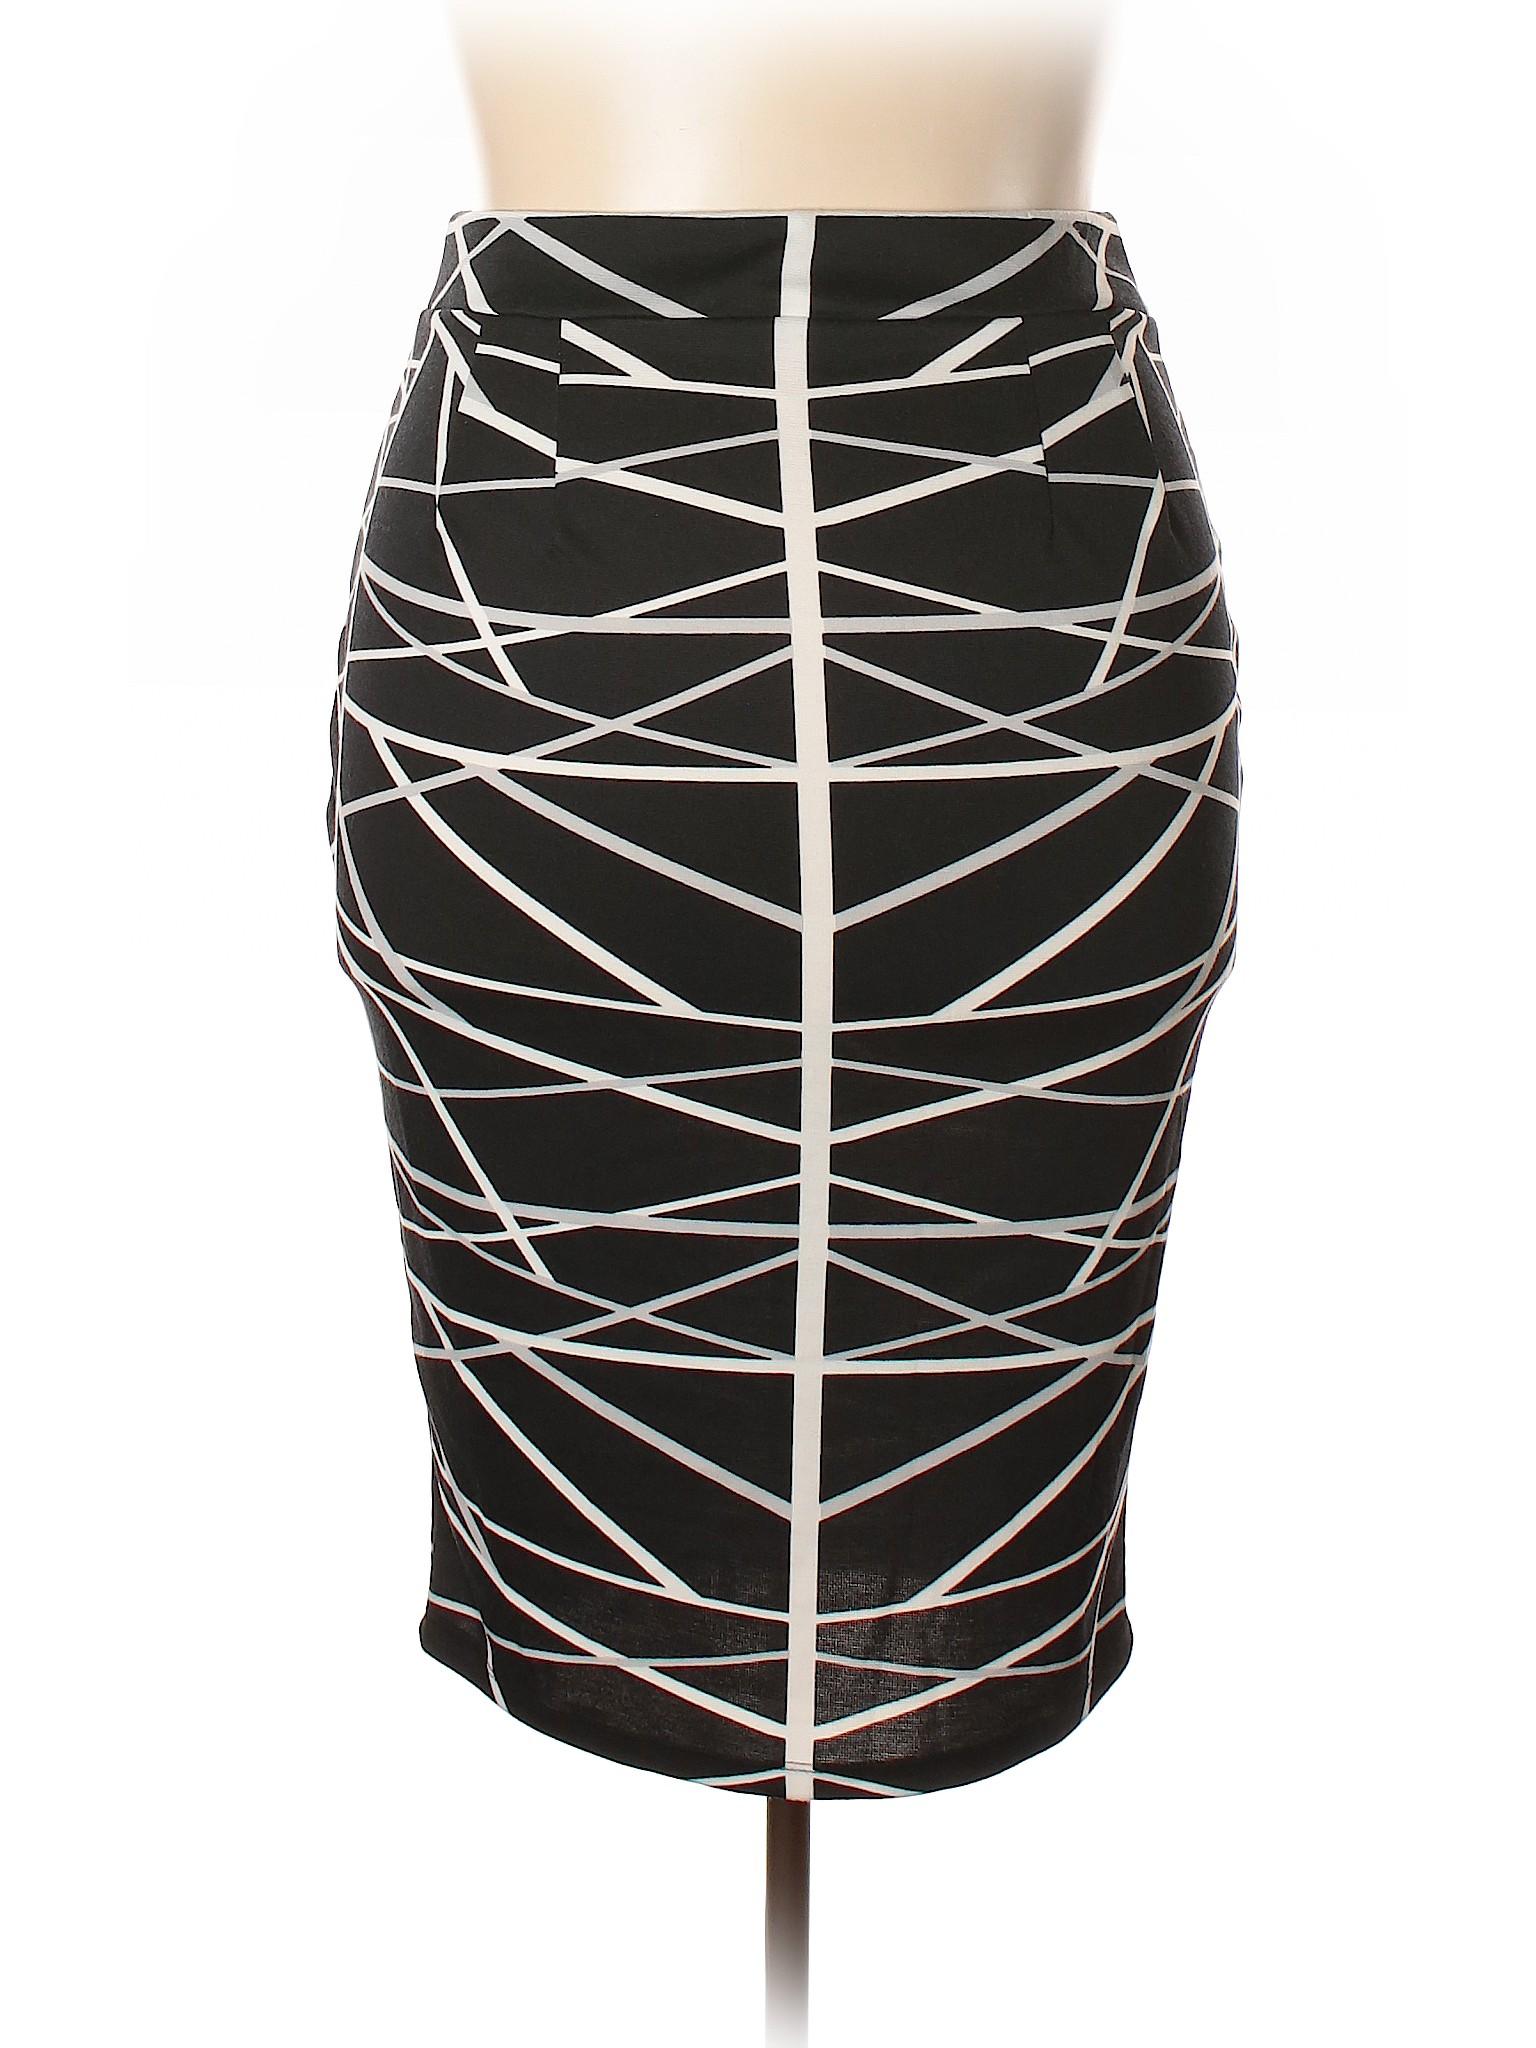 Boutique Boutique Skirt Boutique Casual Casual Boutique Skirt Casual Skirt Casual Boutique Skirt Casual I6wRHH